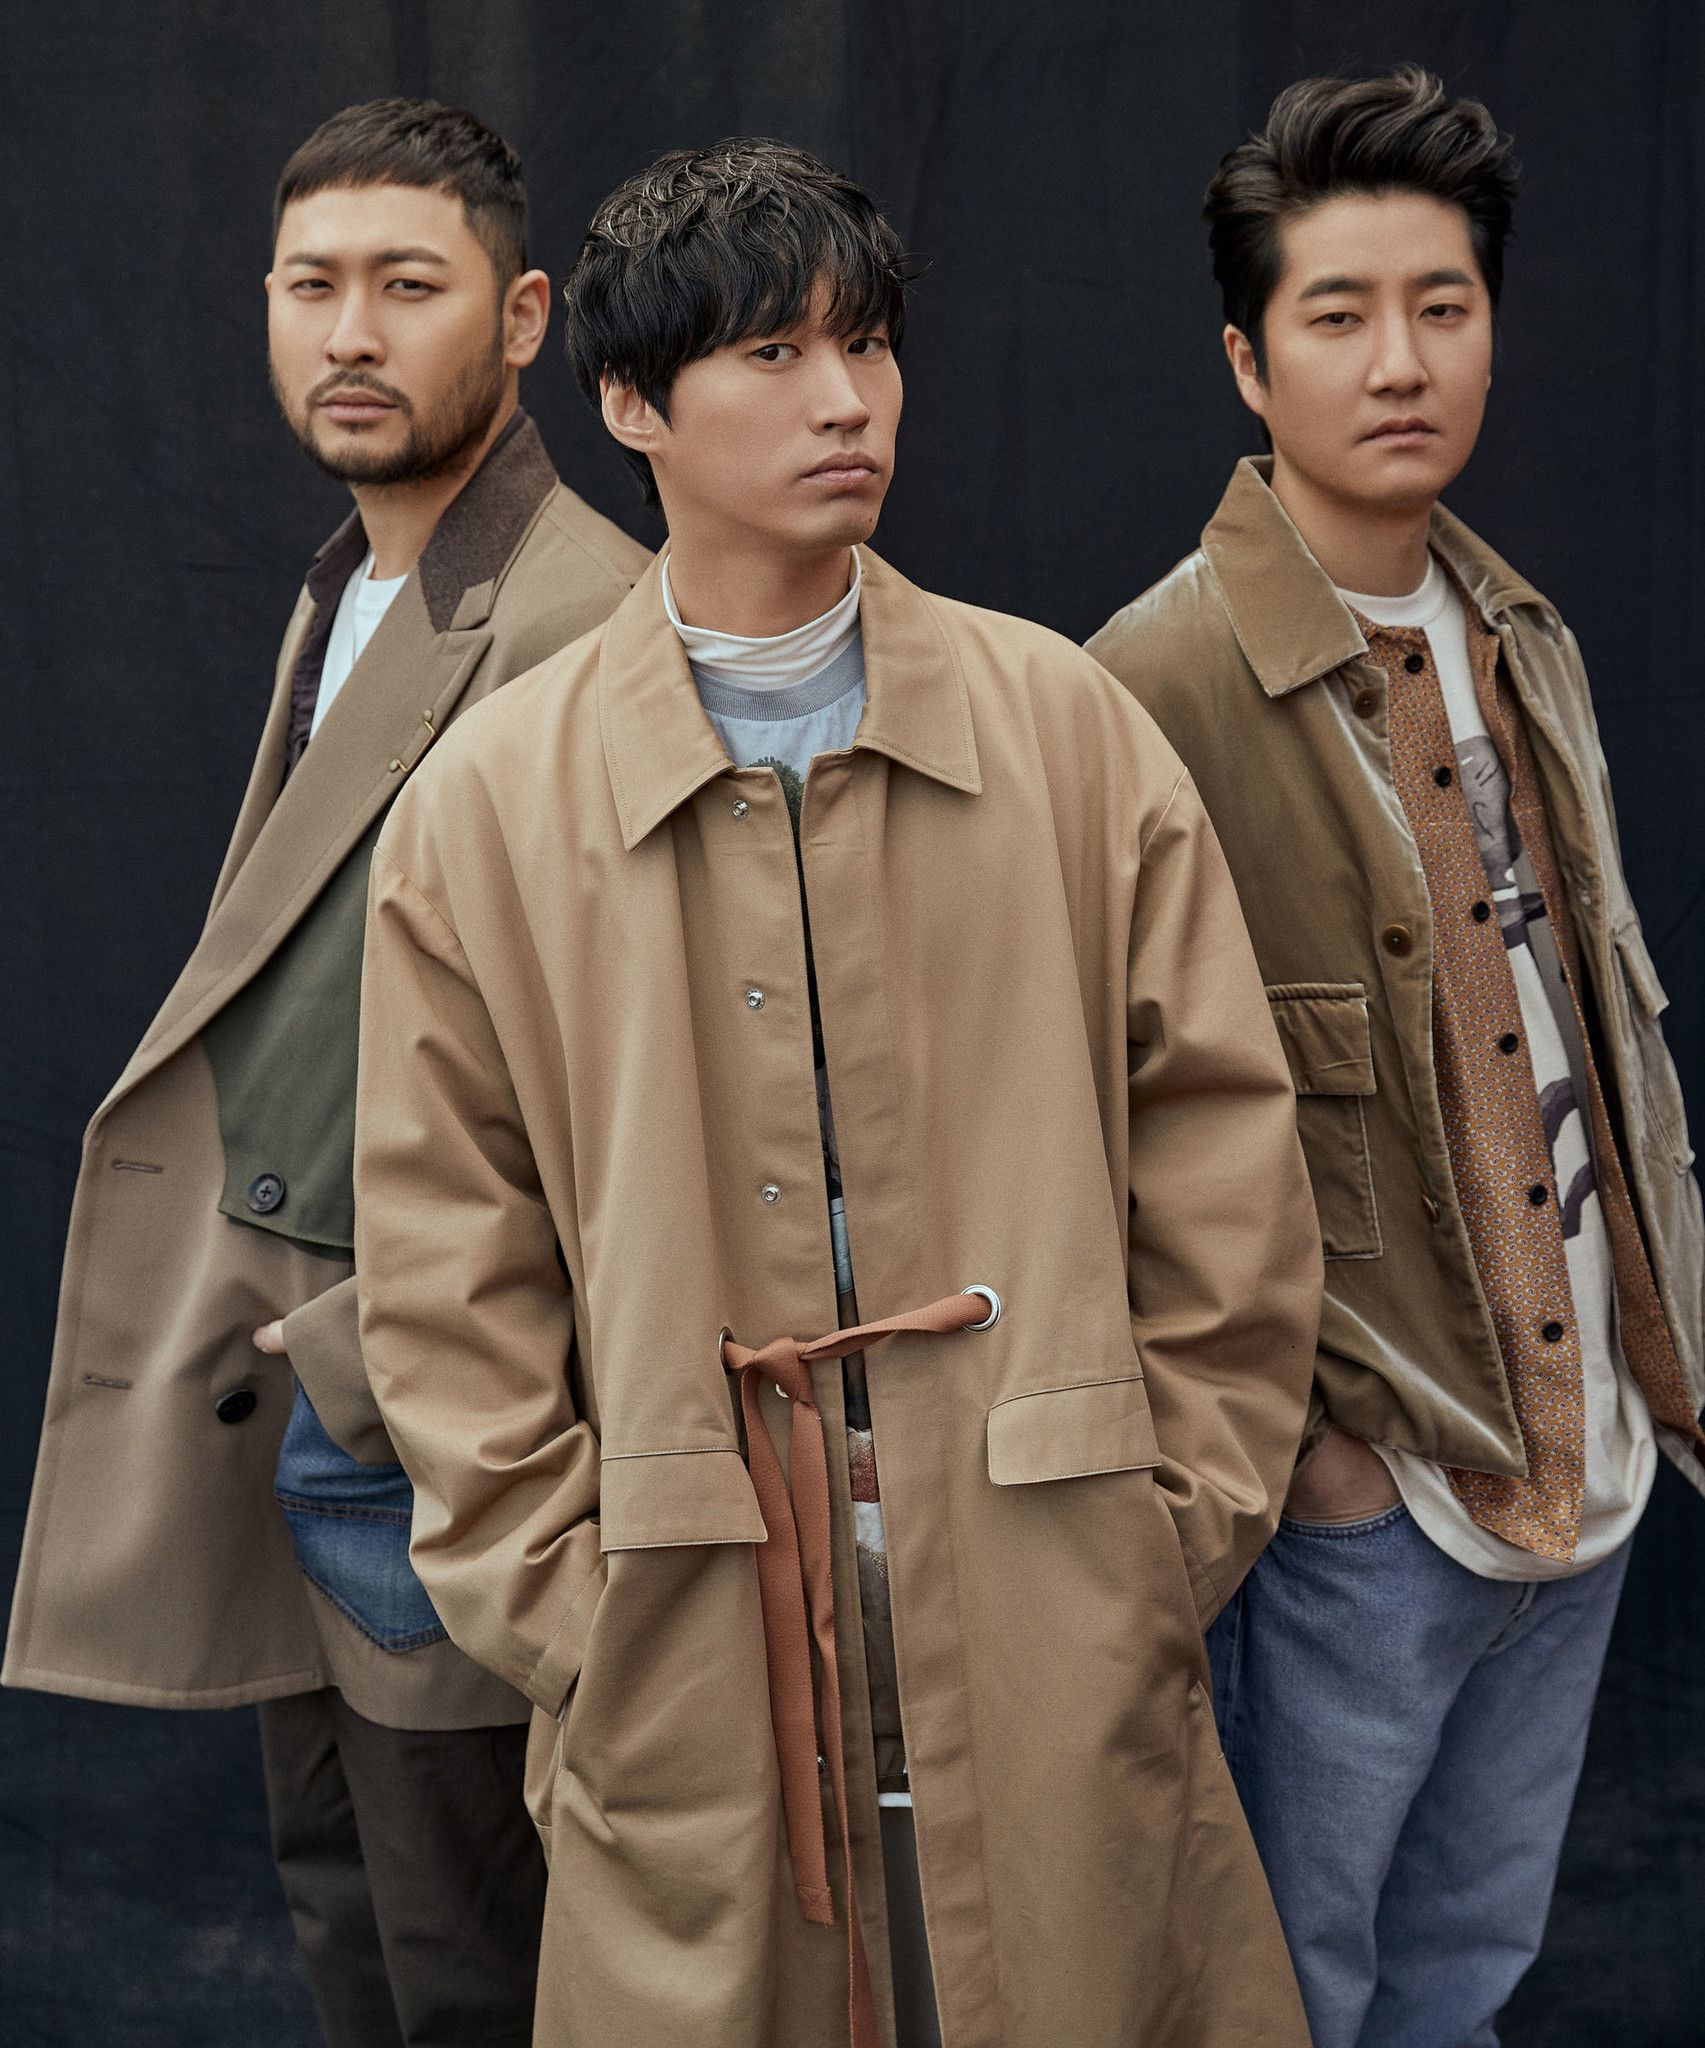 Tablo Of Epik High Talks Travel And How It Affected His Music Tablo Epik High Good Looking Men Boy Groups